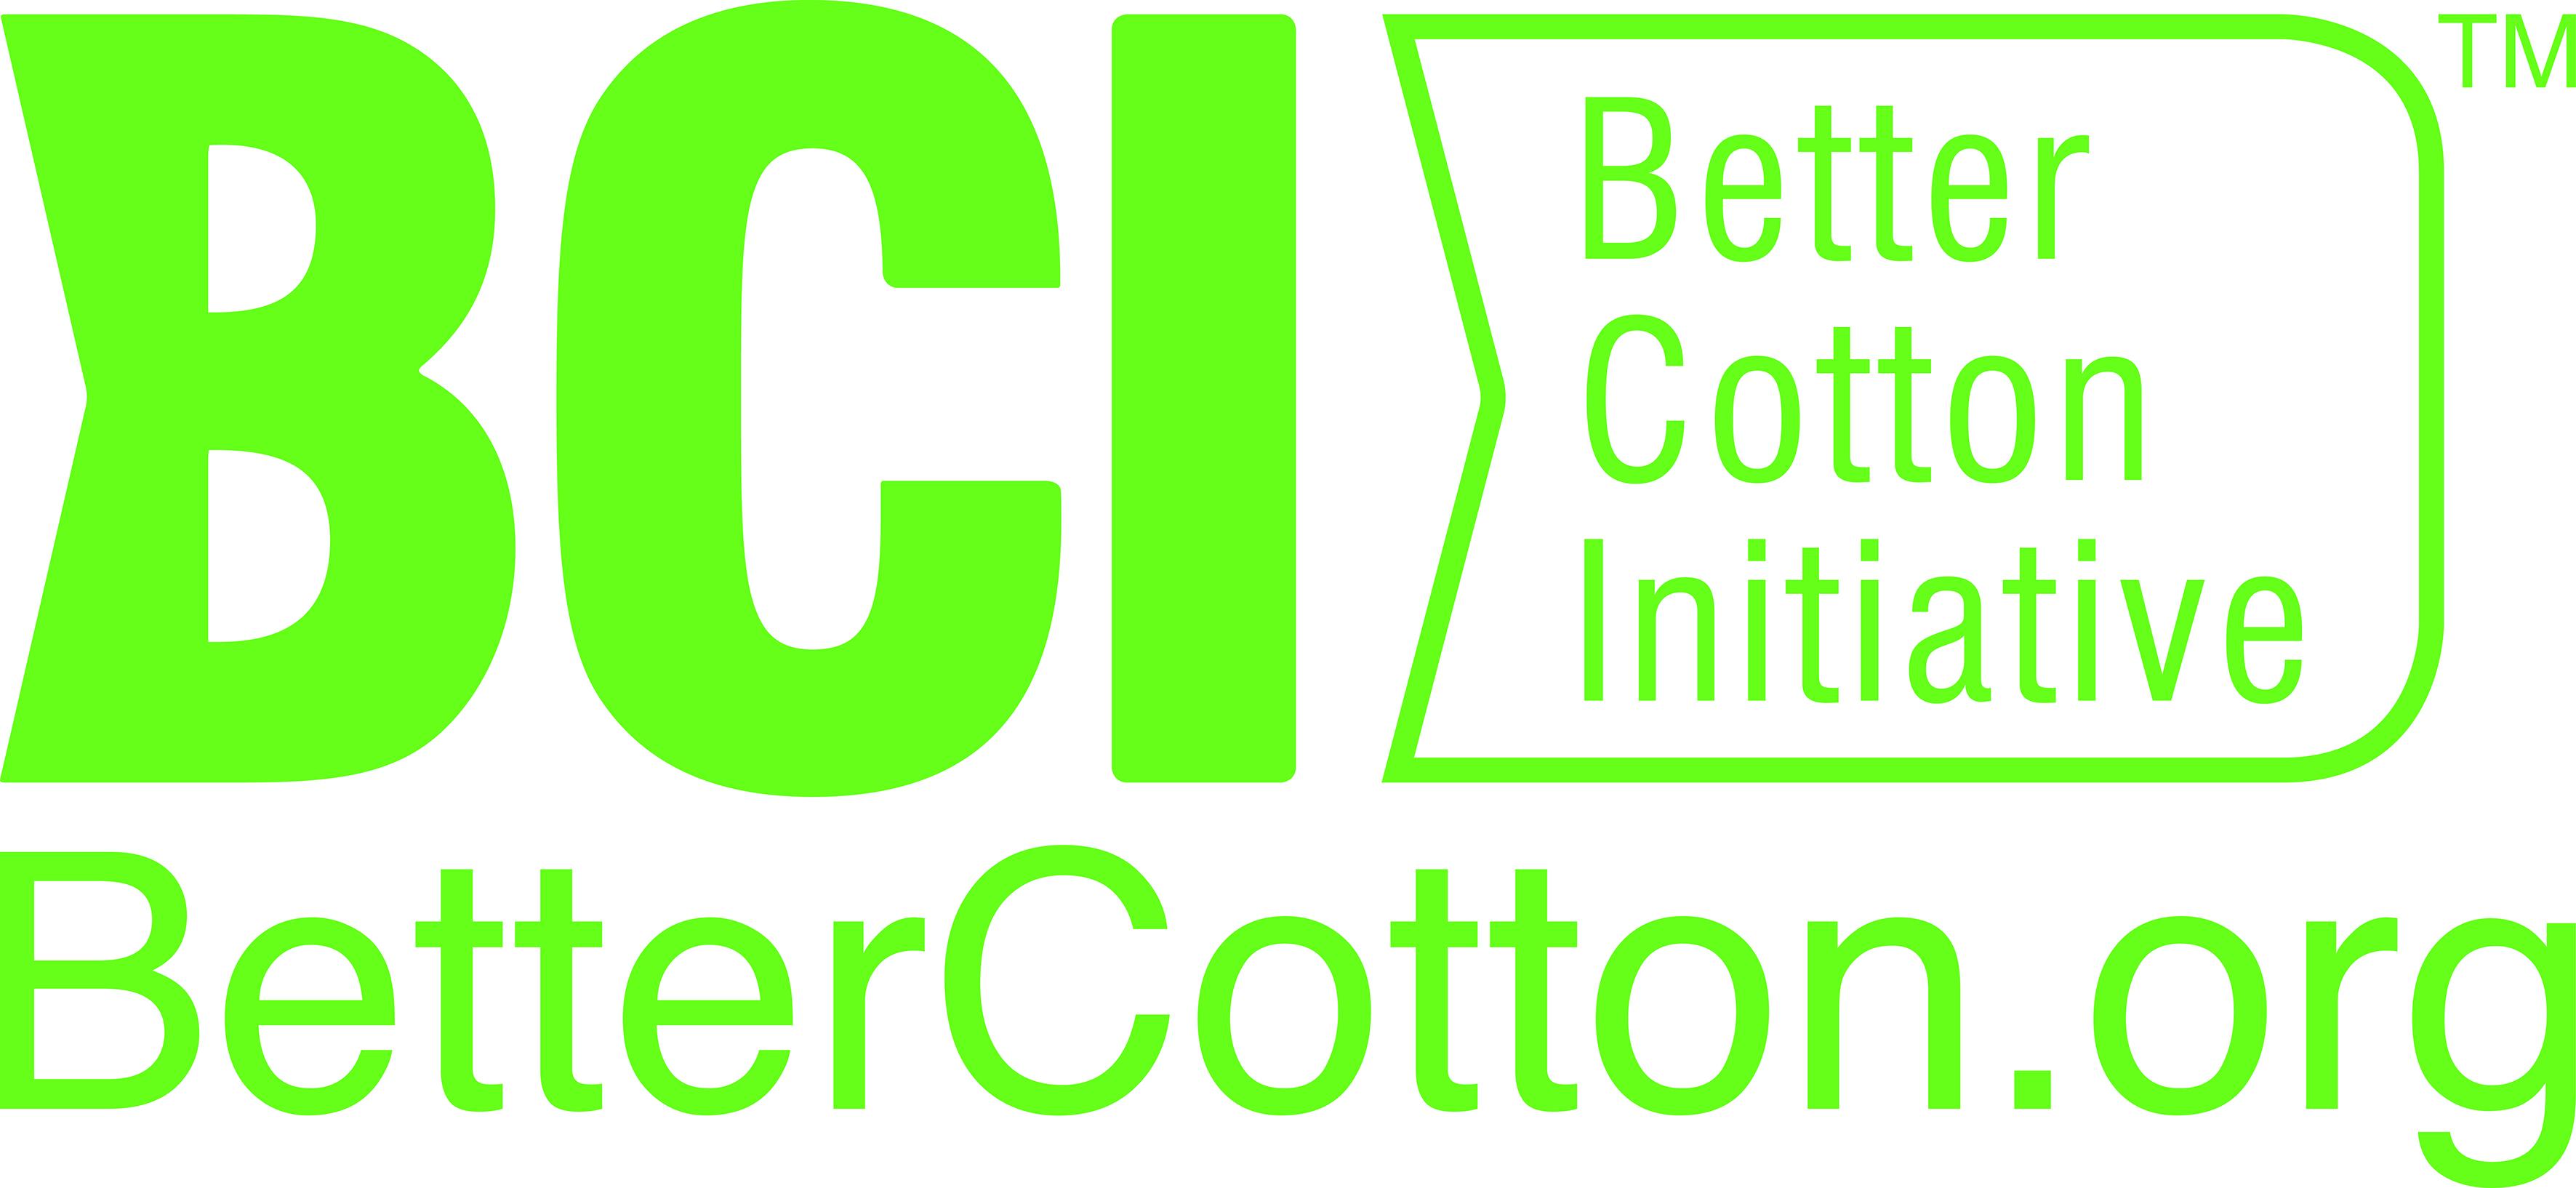 Better Cotton Initiative logo